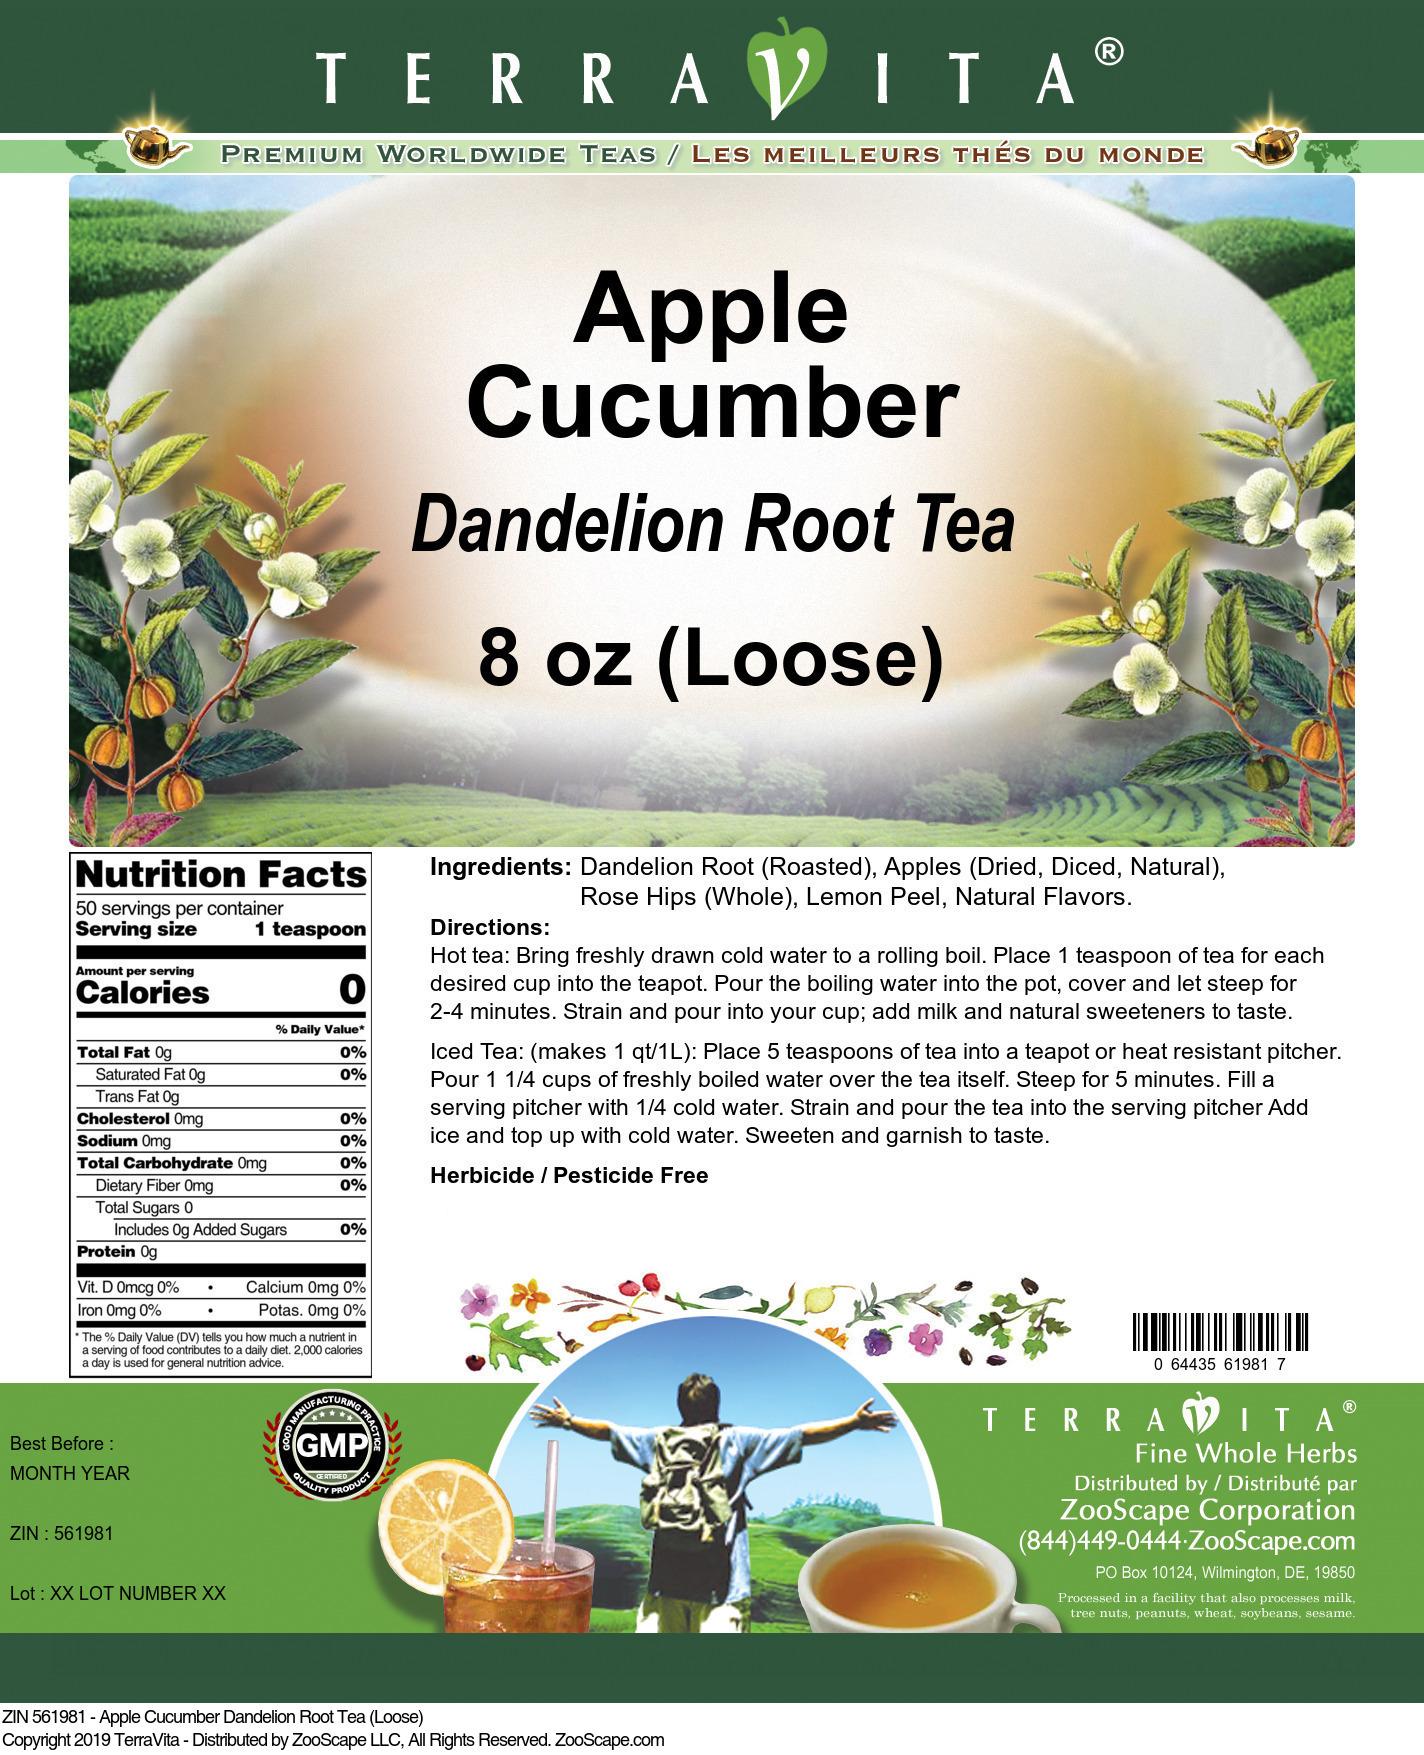 Apple Cucumber Dandelion Root Tea (Loose)